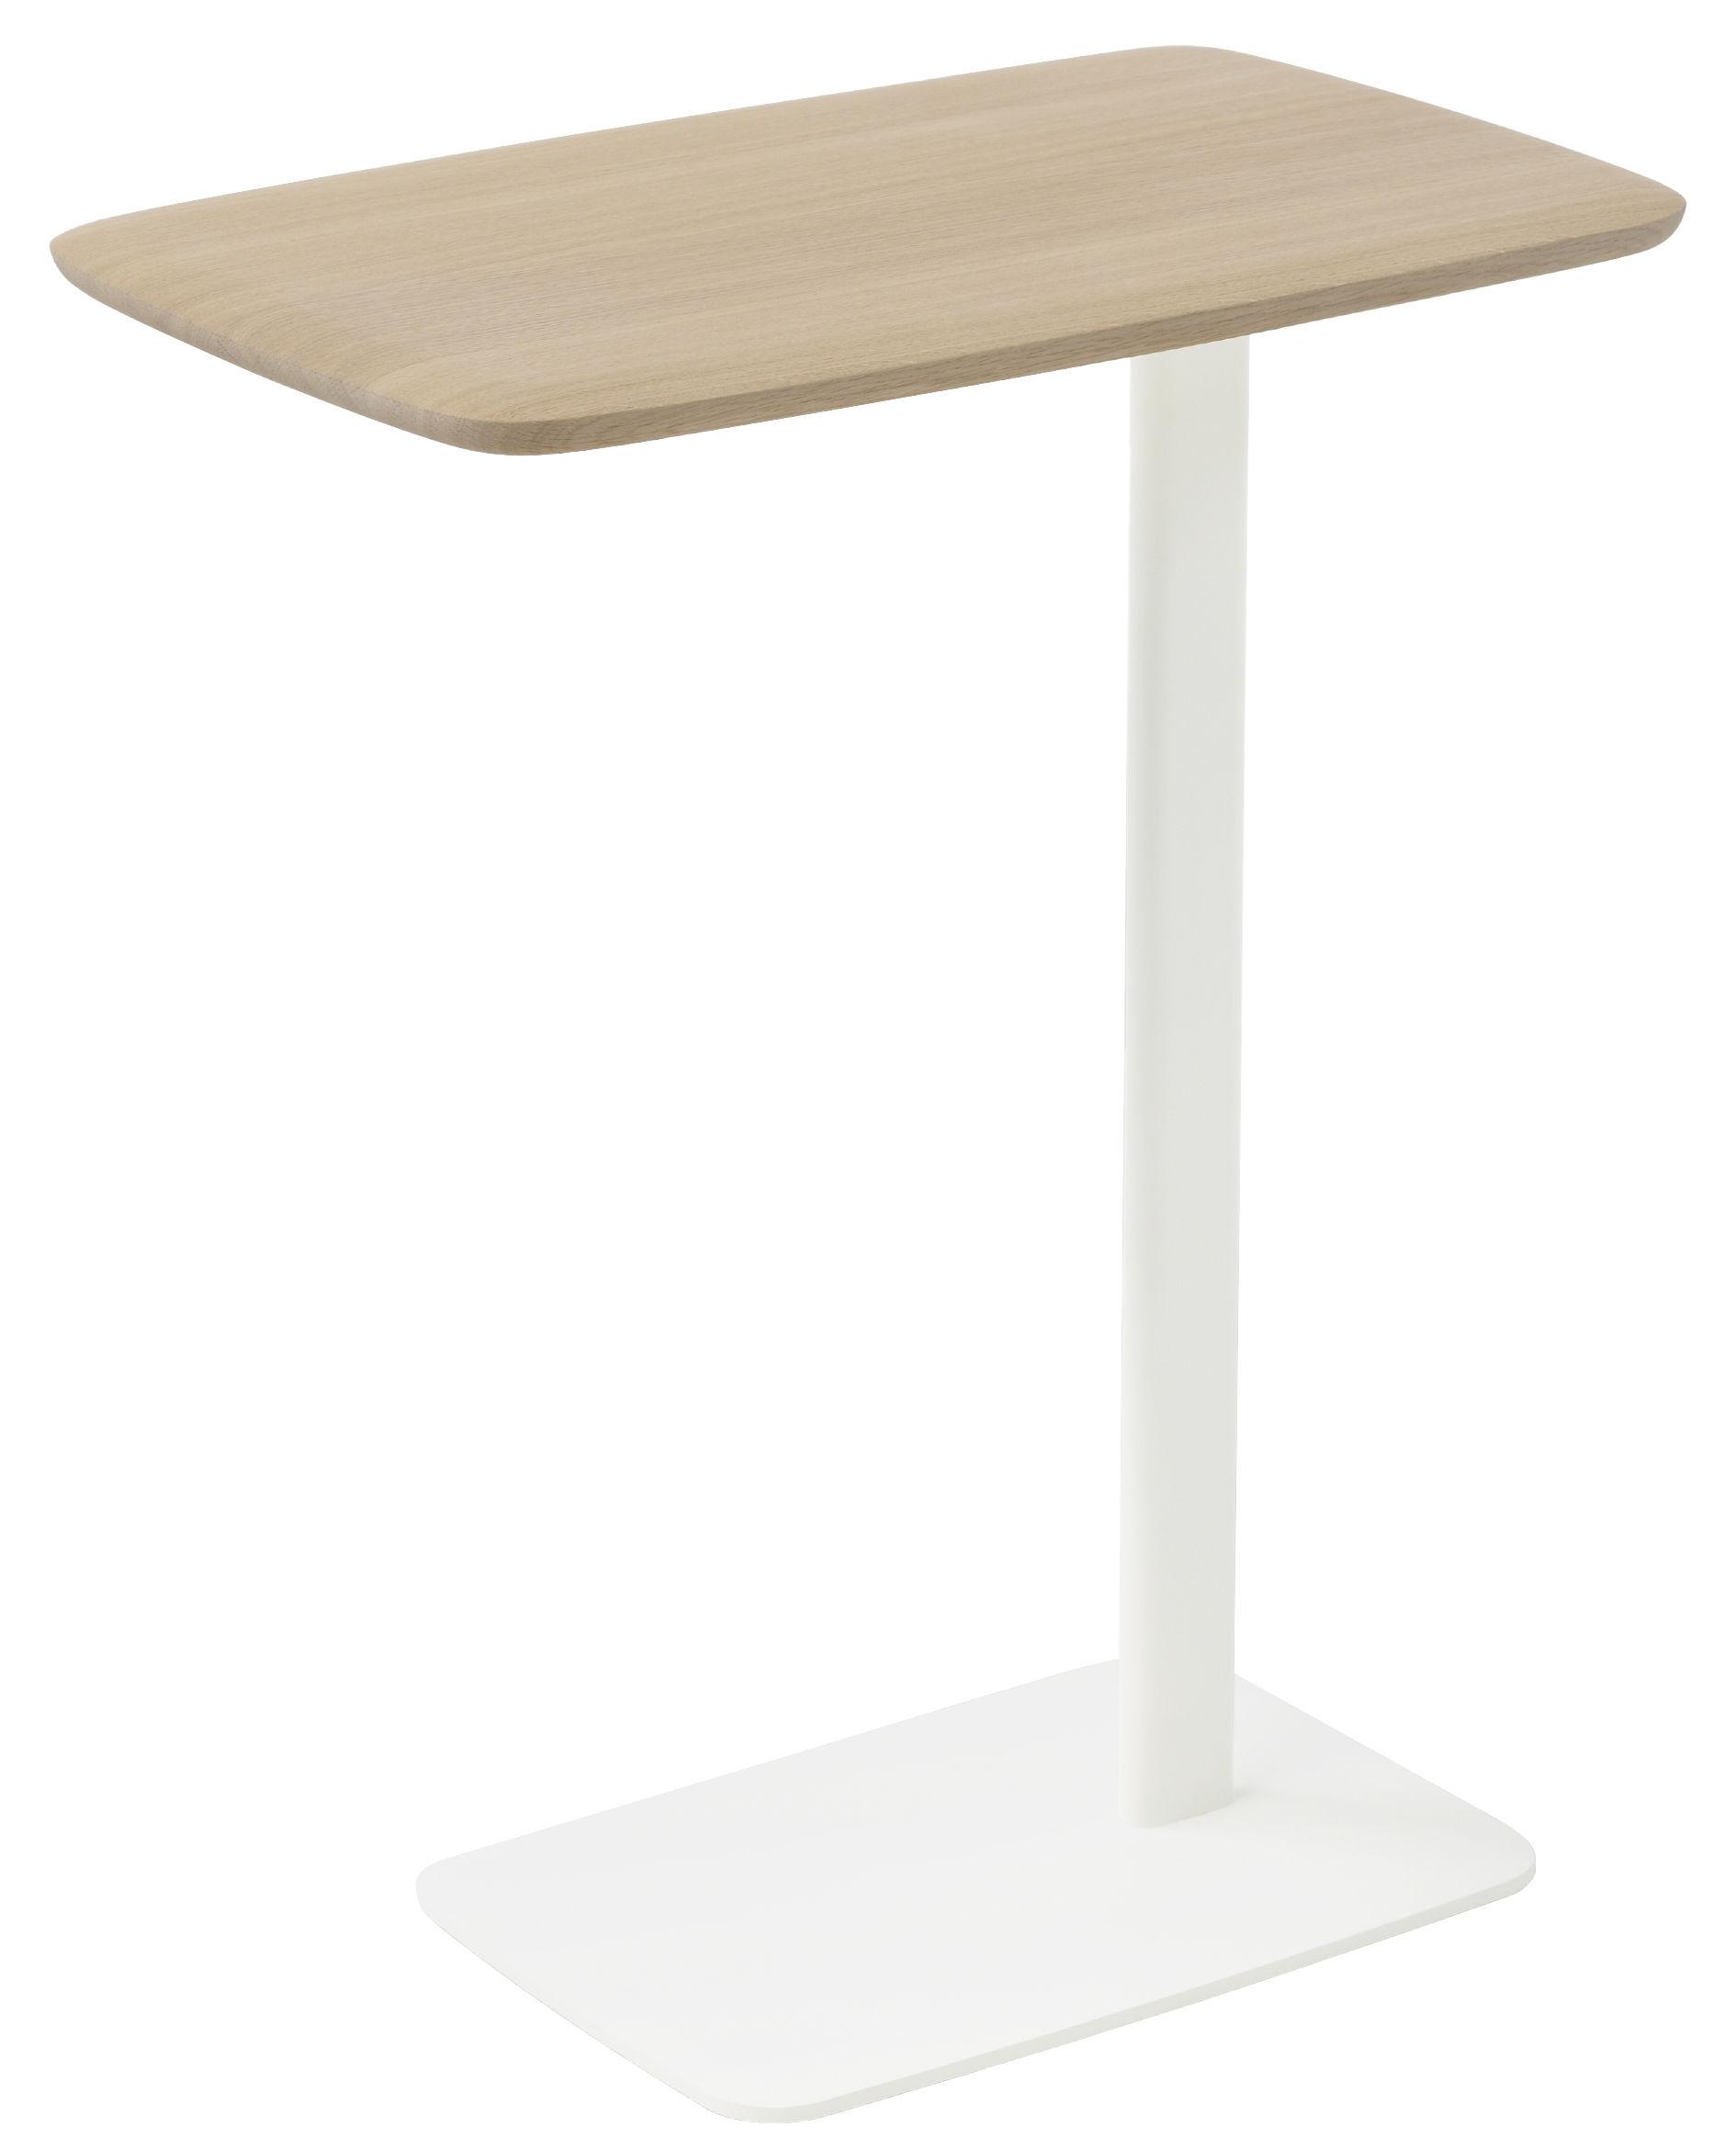 table d 39 appoint ustensils h 63 cm pour ordi portable. Black Bedroom Furniture Sets. Home Design Ideas